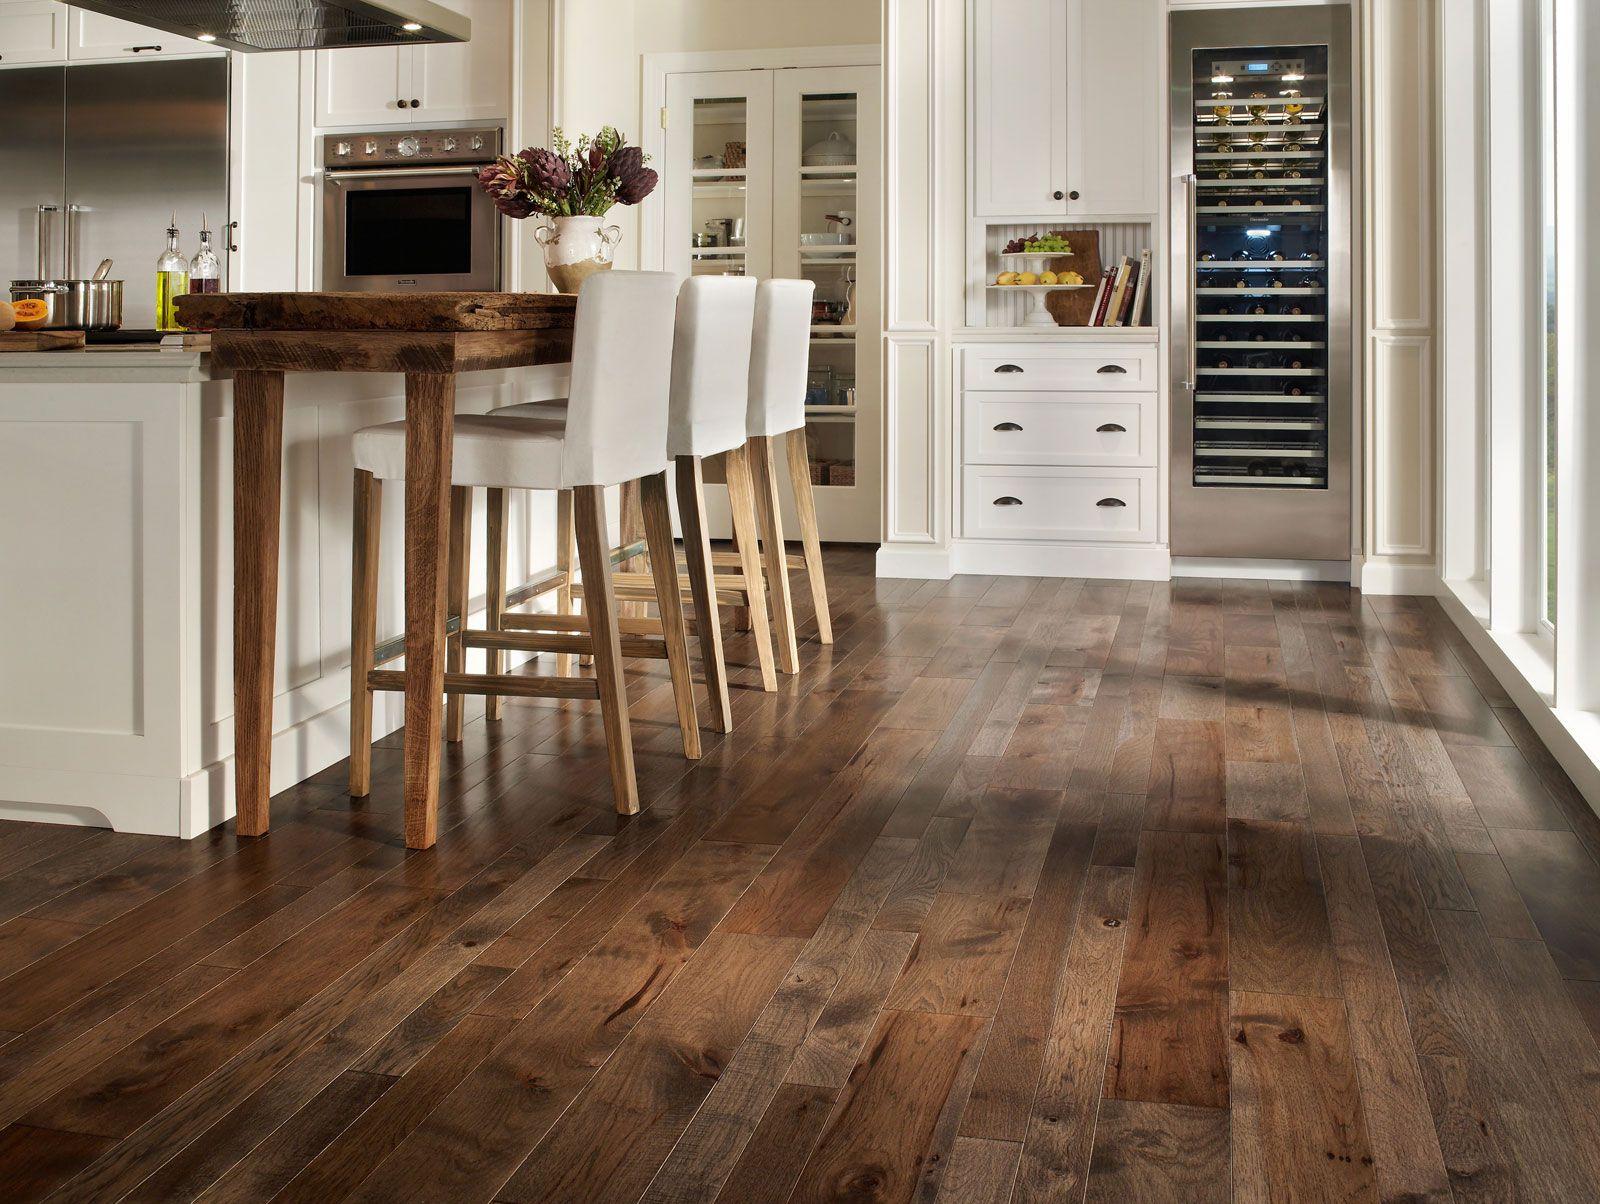 Artwork of Most Popular Hardwood Floor Colors that Make